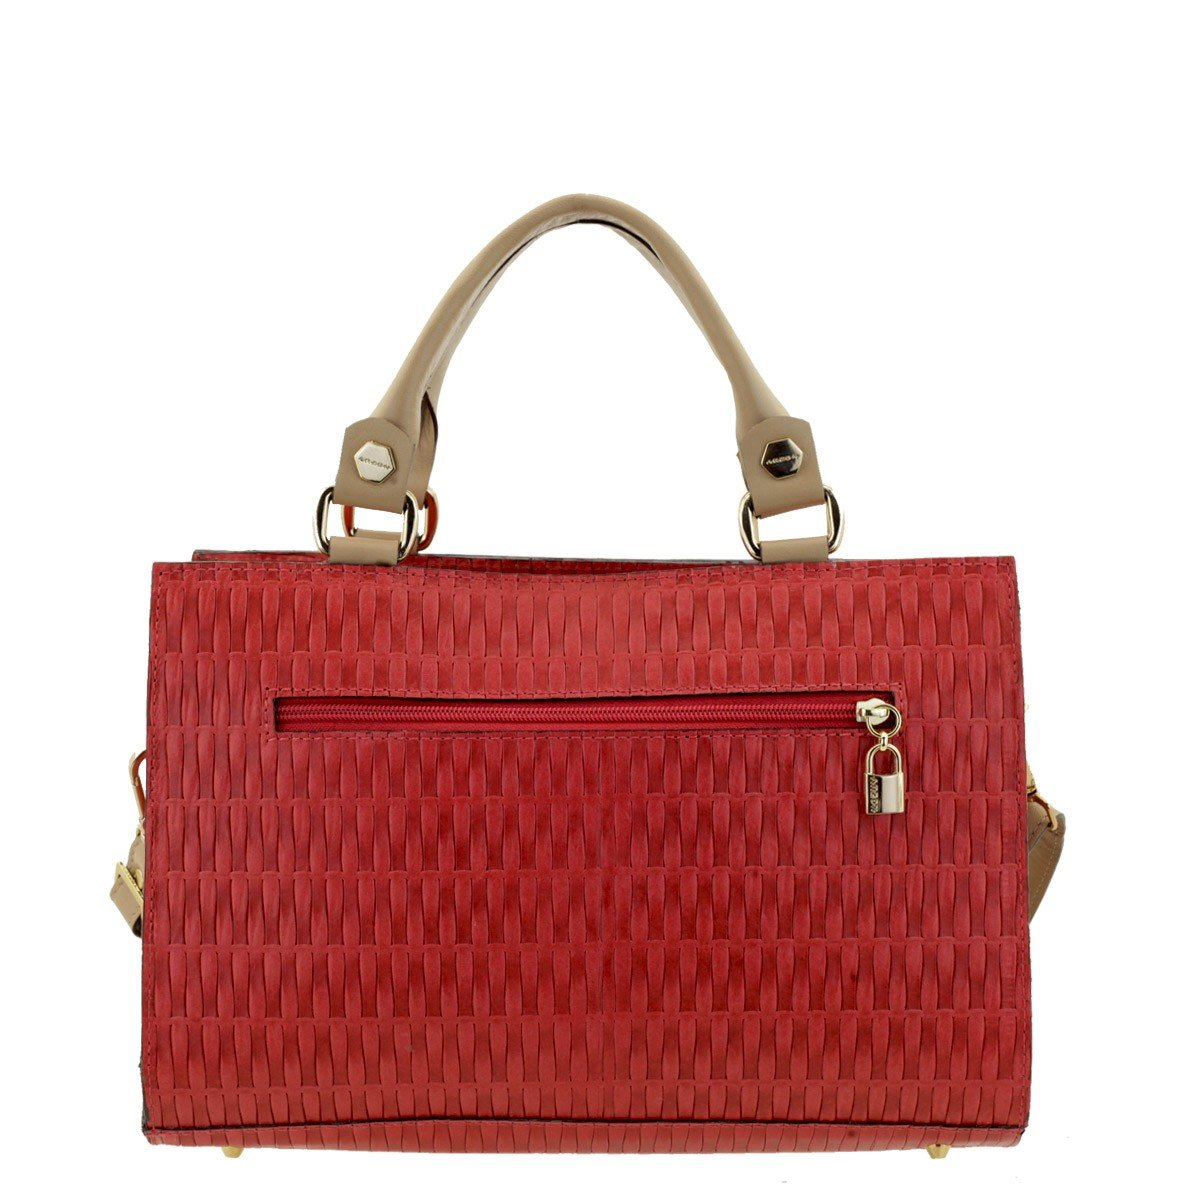 Bolsa Couro Feminina Vermelha